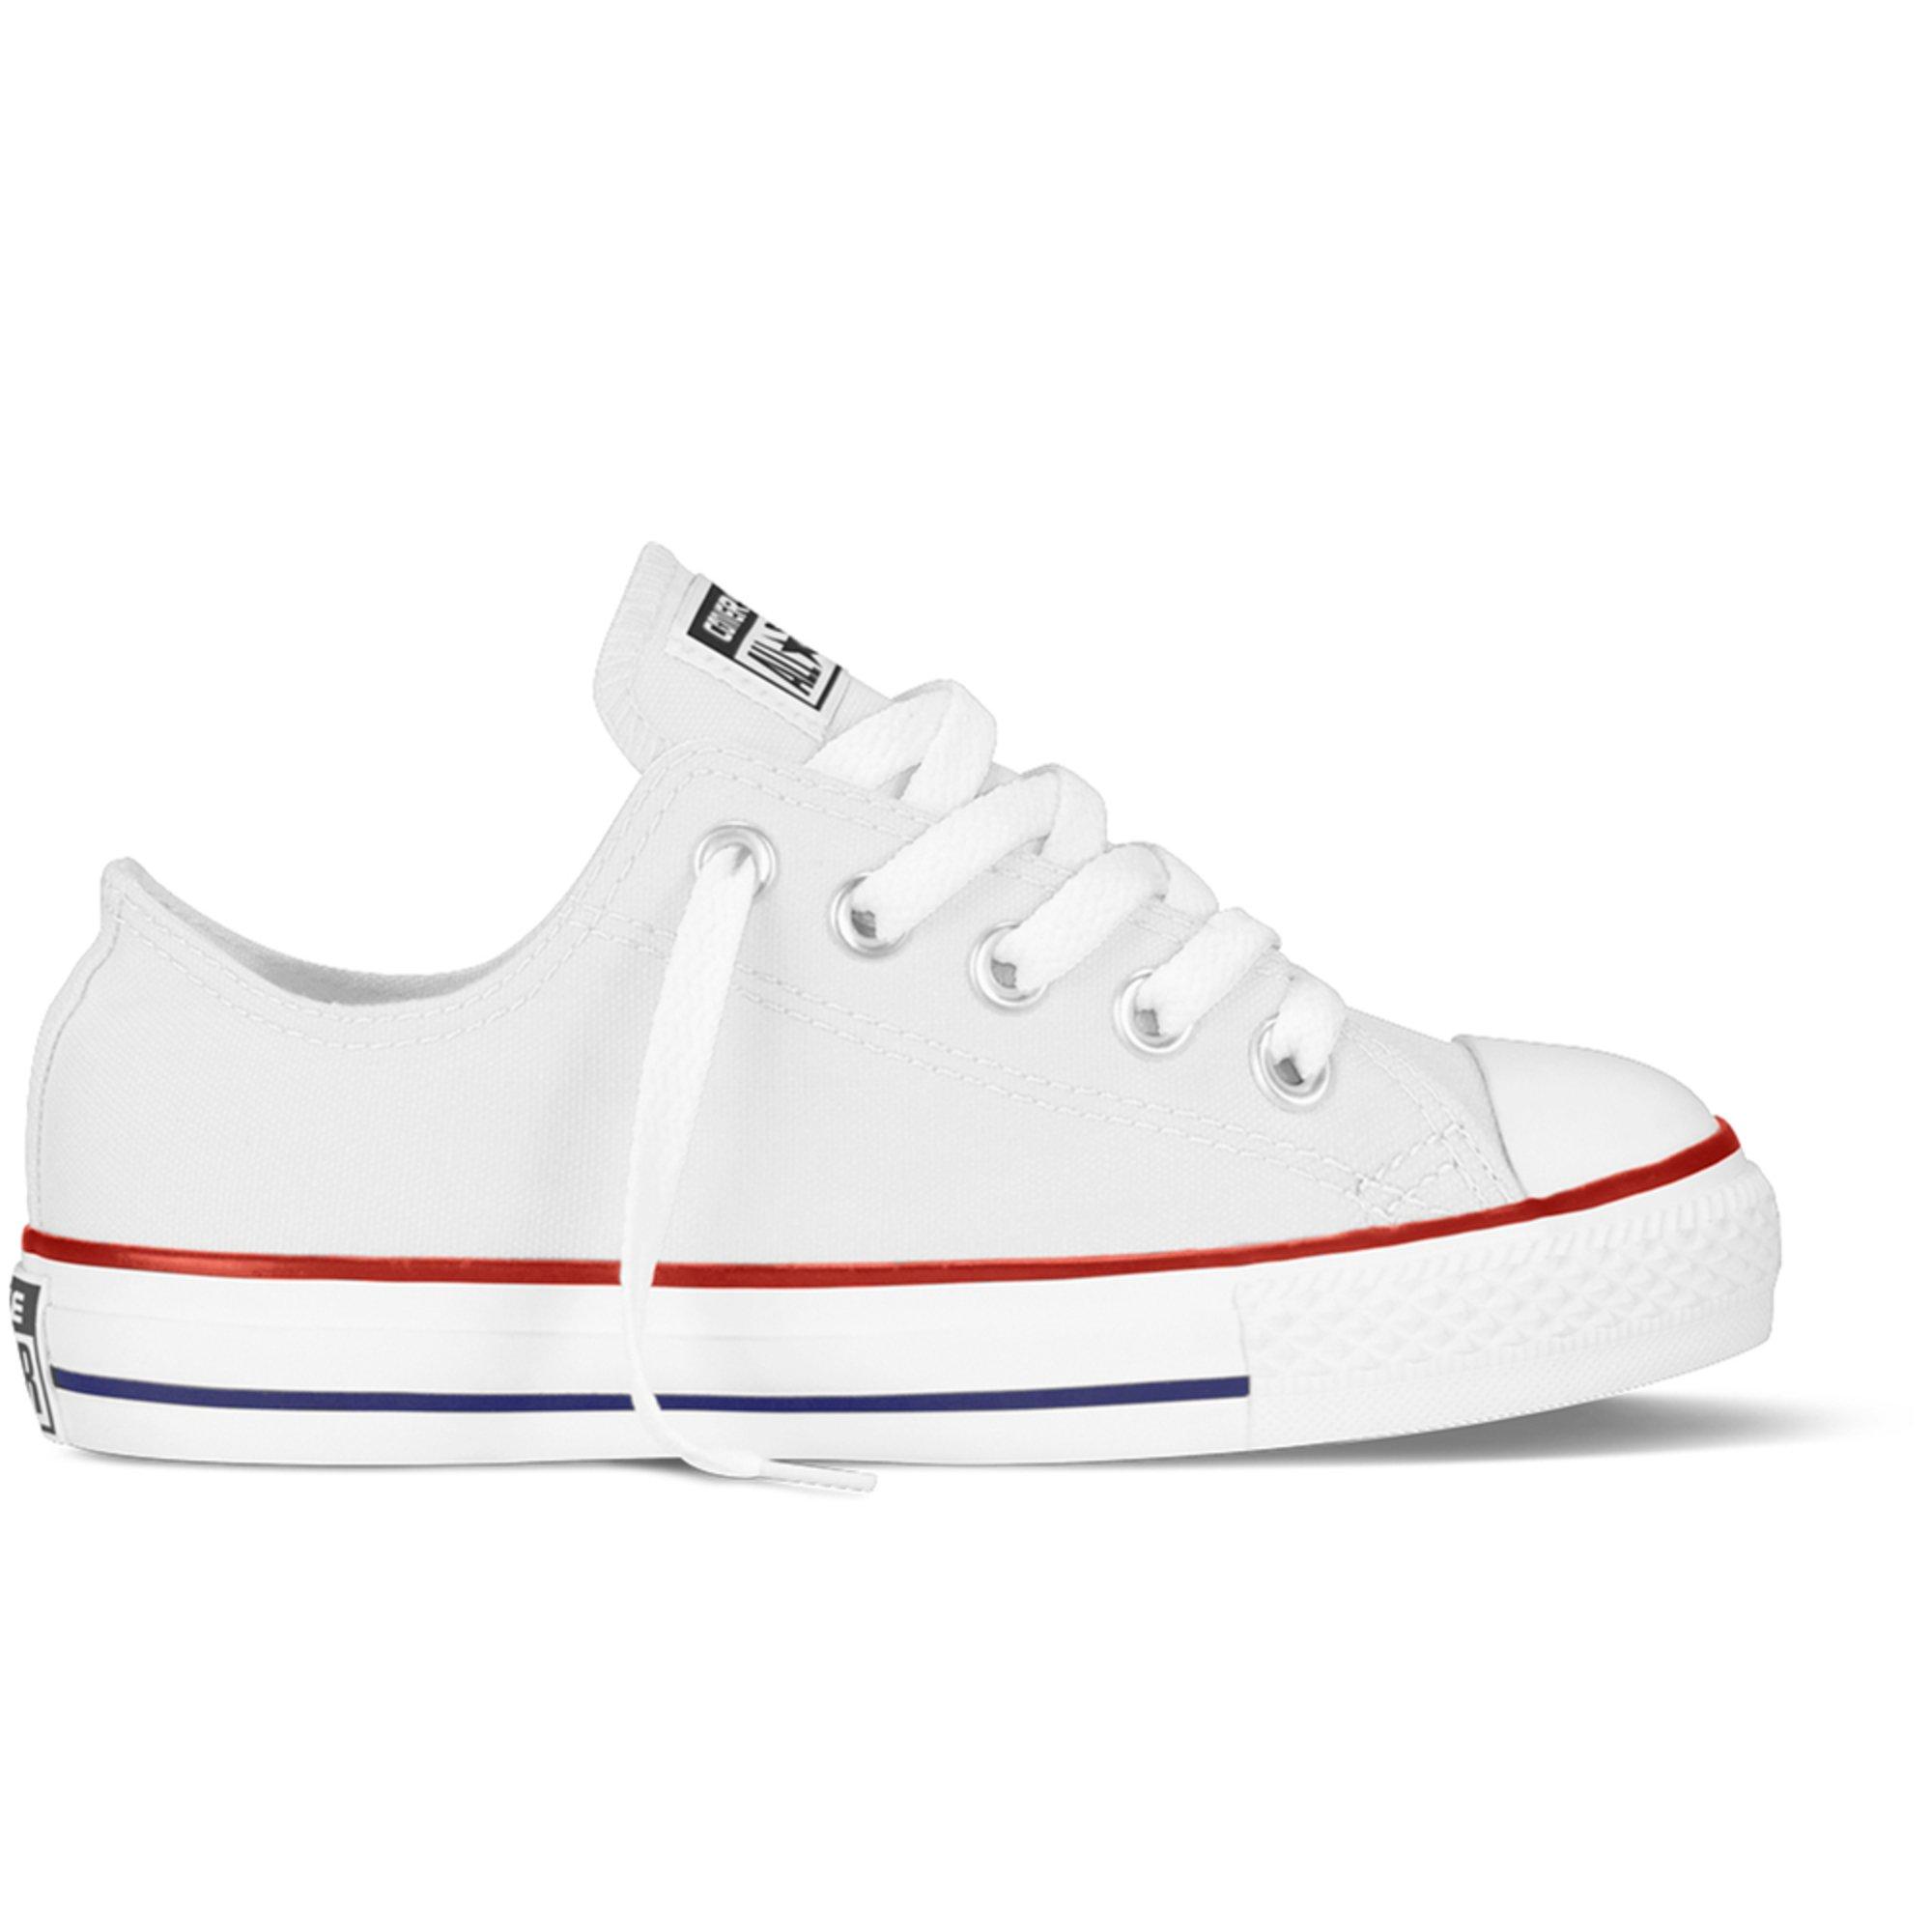 b3c1f032eba8 Converse. Converse Girls Chuck Taylor All Star Sneaker (Little Kid)